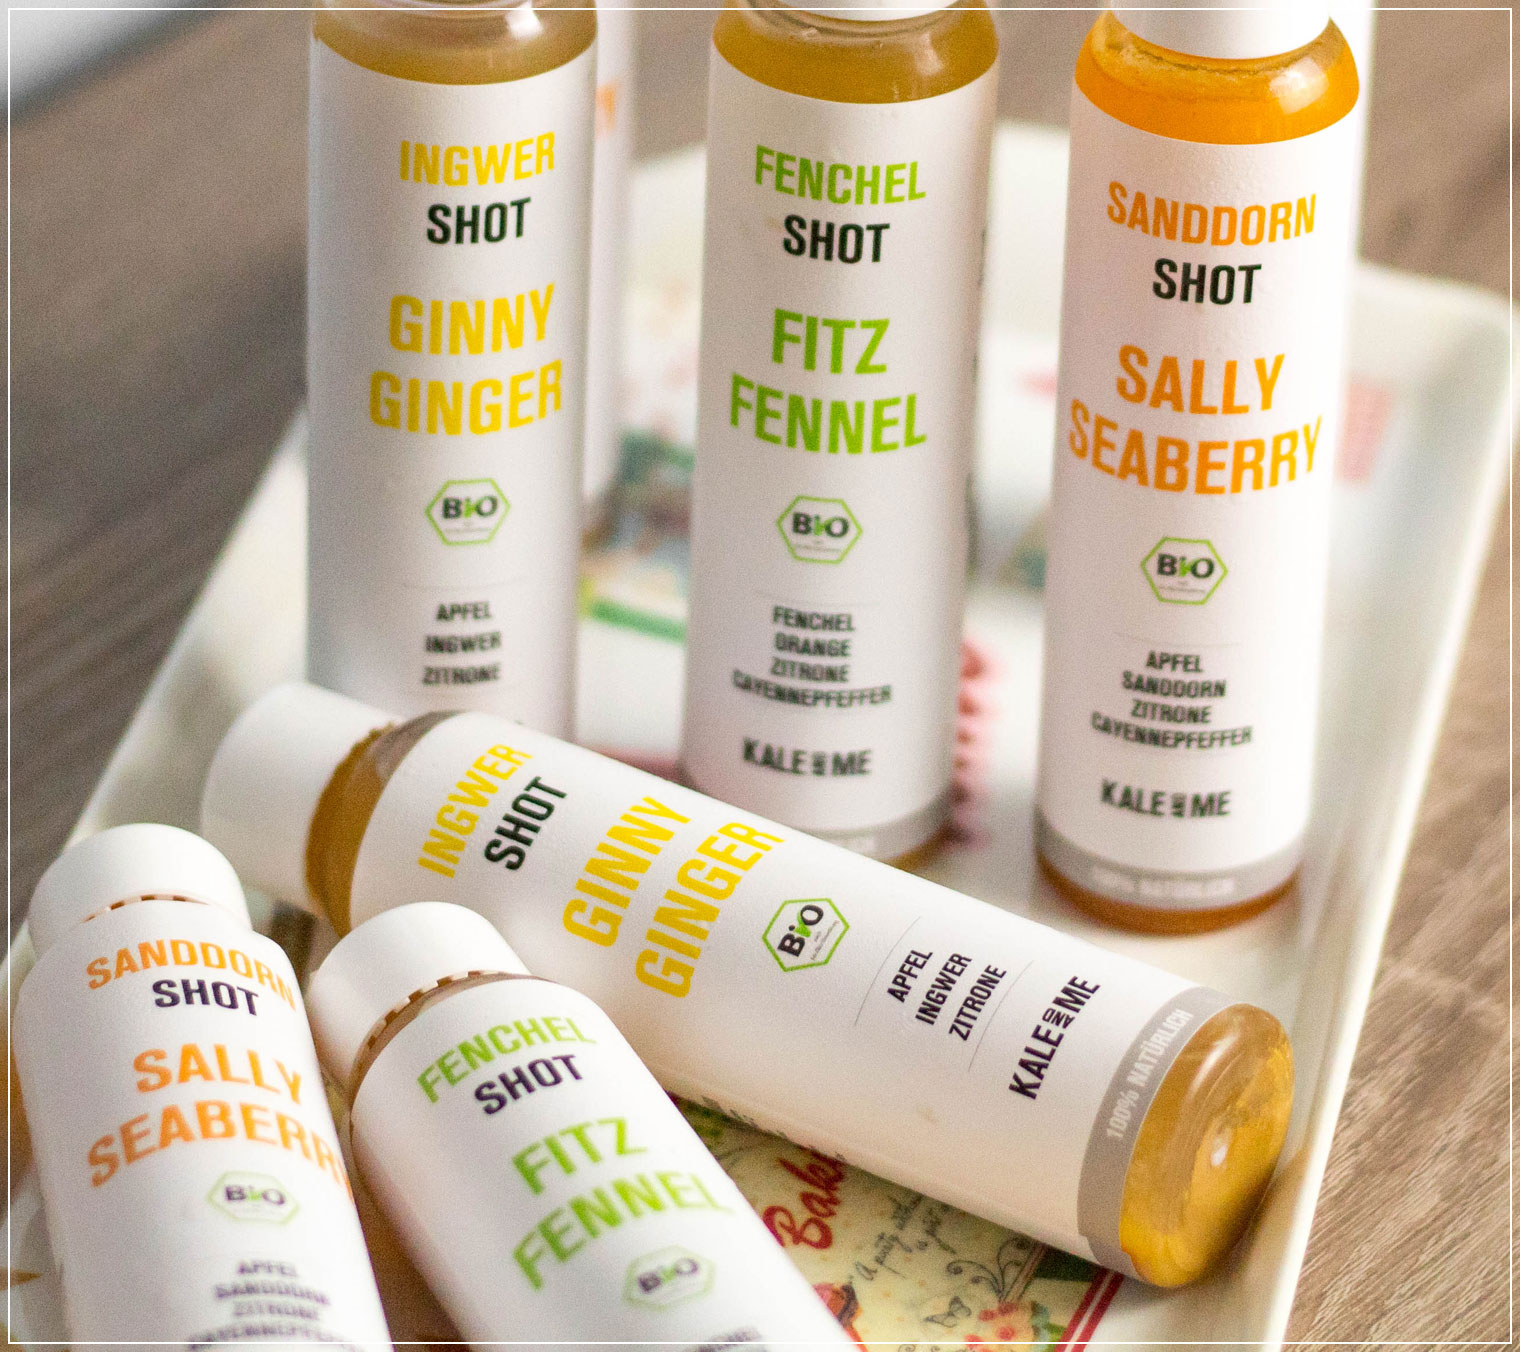 Kale and Me, Shots, Ingwer Shot, kaltgepresst, Saftkur, Vegan, Foodblogger, Kale and Me Review, Energie Kick